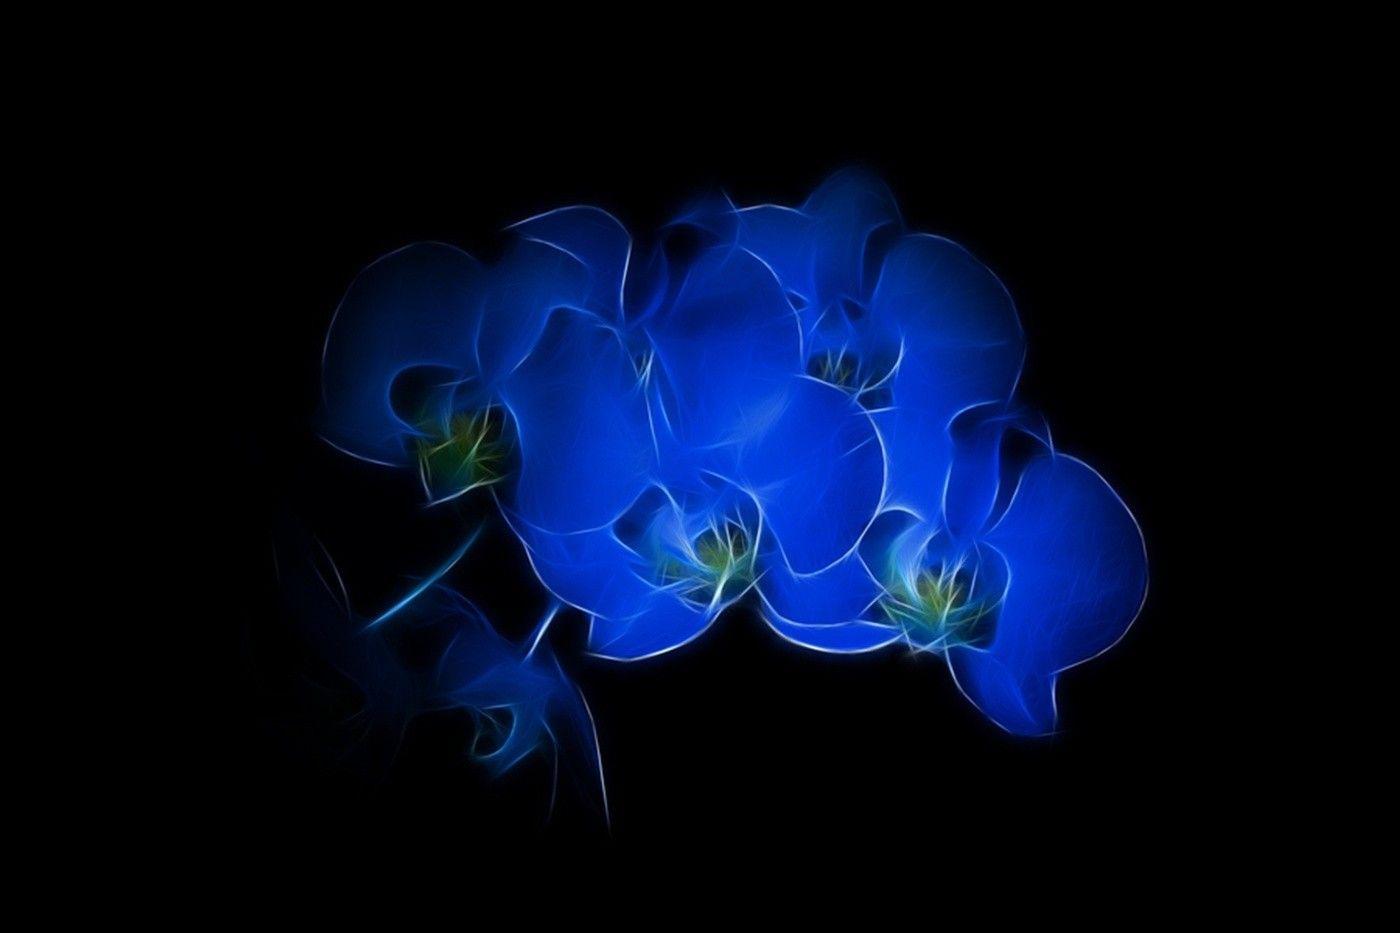 Fractalius, Black Background, Flowers, Blue Flowers